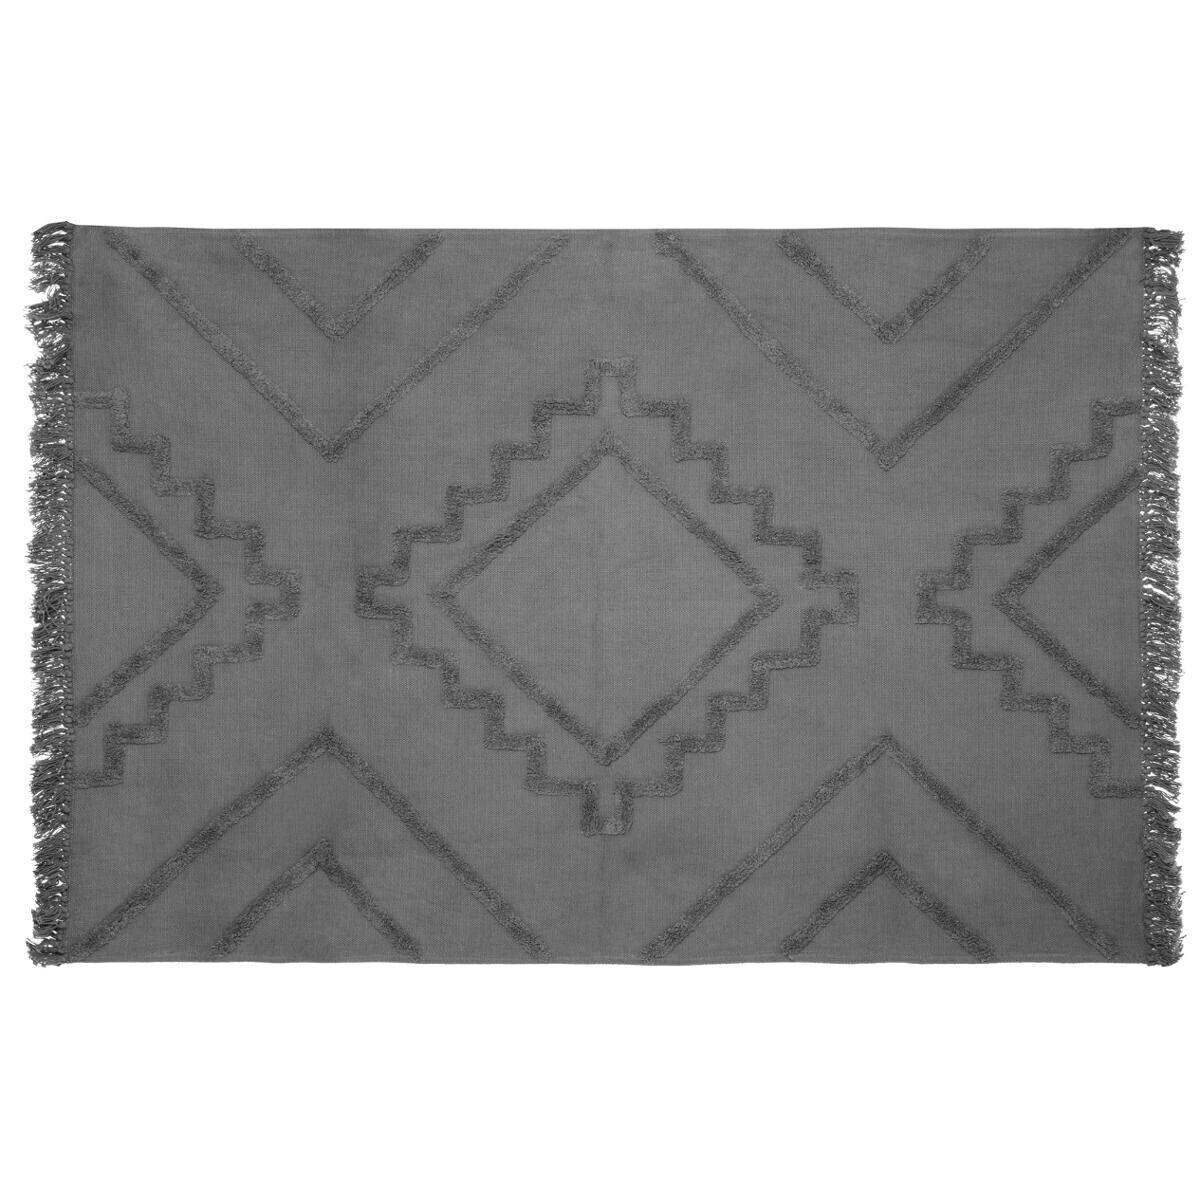 "Atmosphera Tapis en coton tufté ""Inca"" gris 120x170 cm"